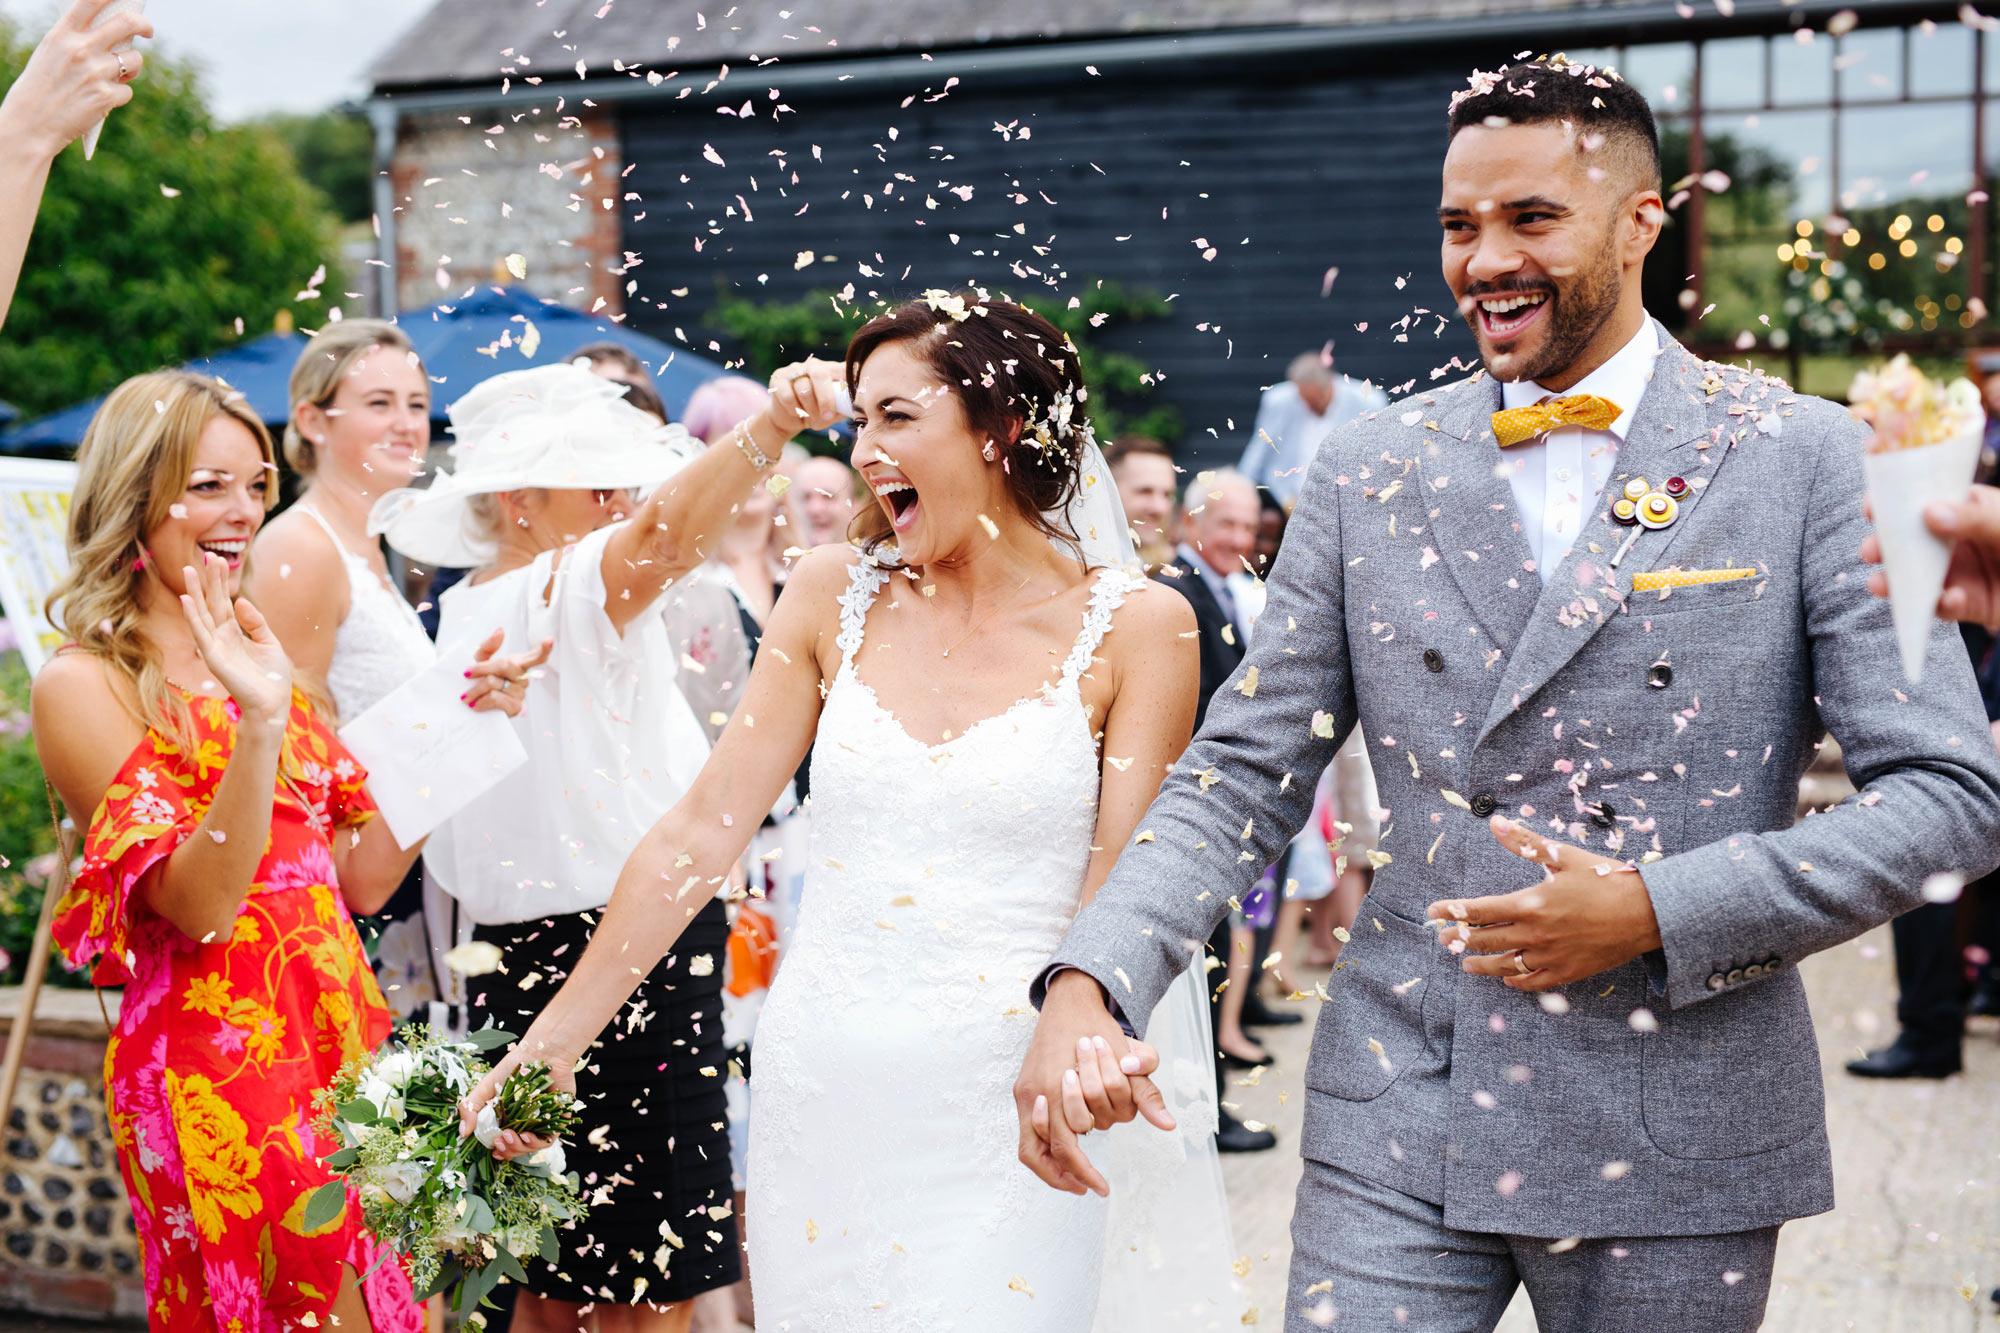 BeckyLee-wedding8.jpg